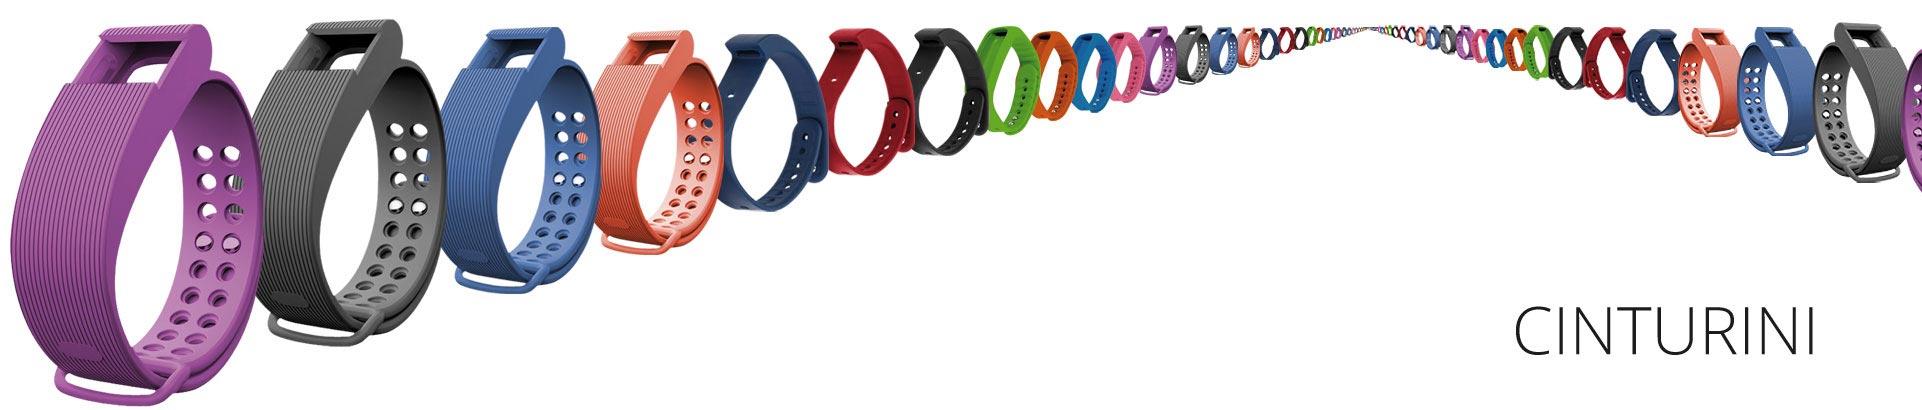 Cinturini KYCB0016-20